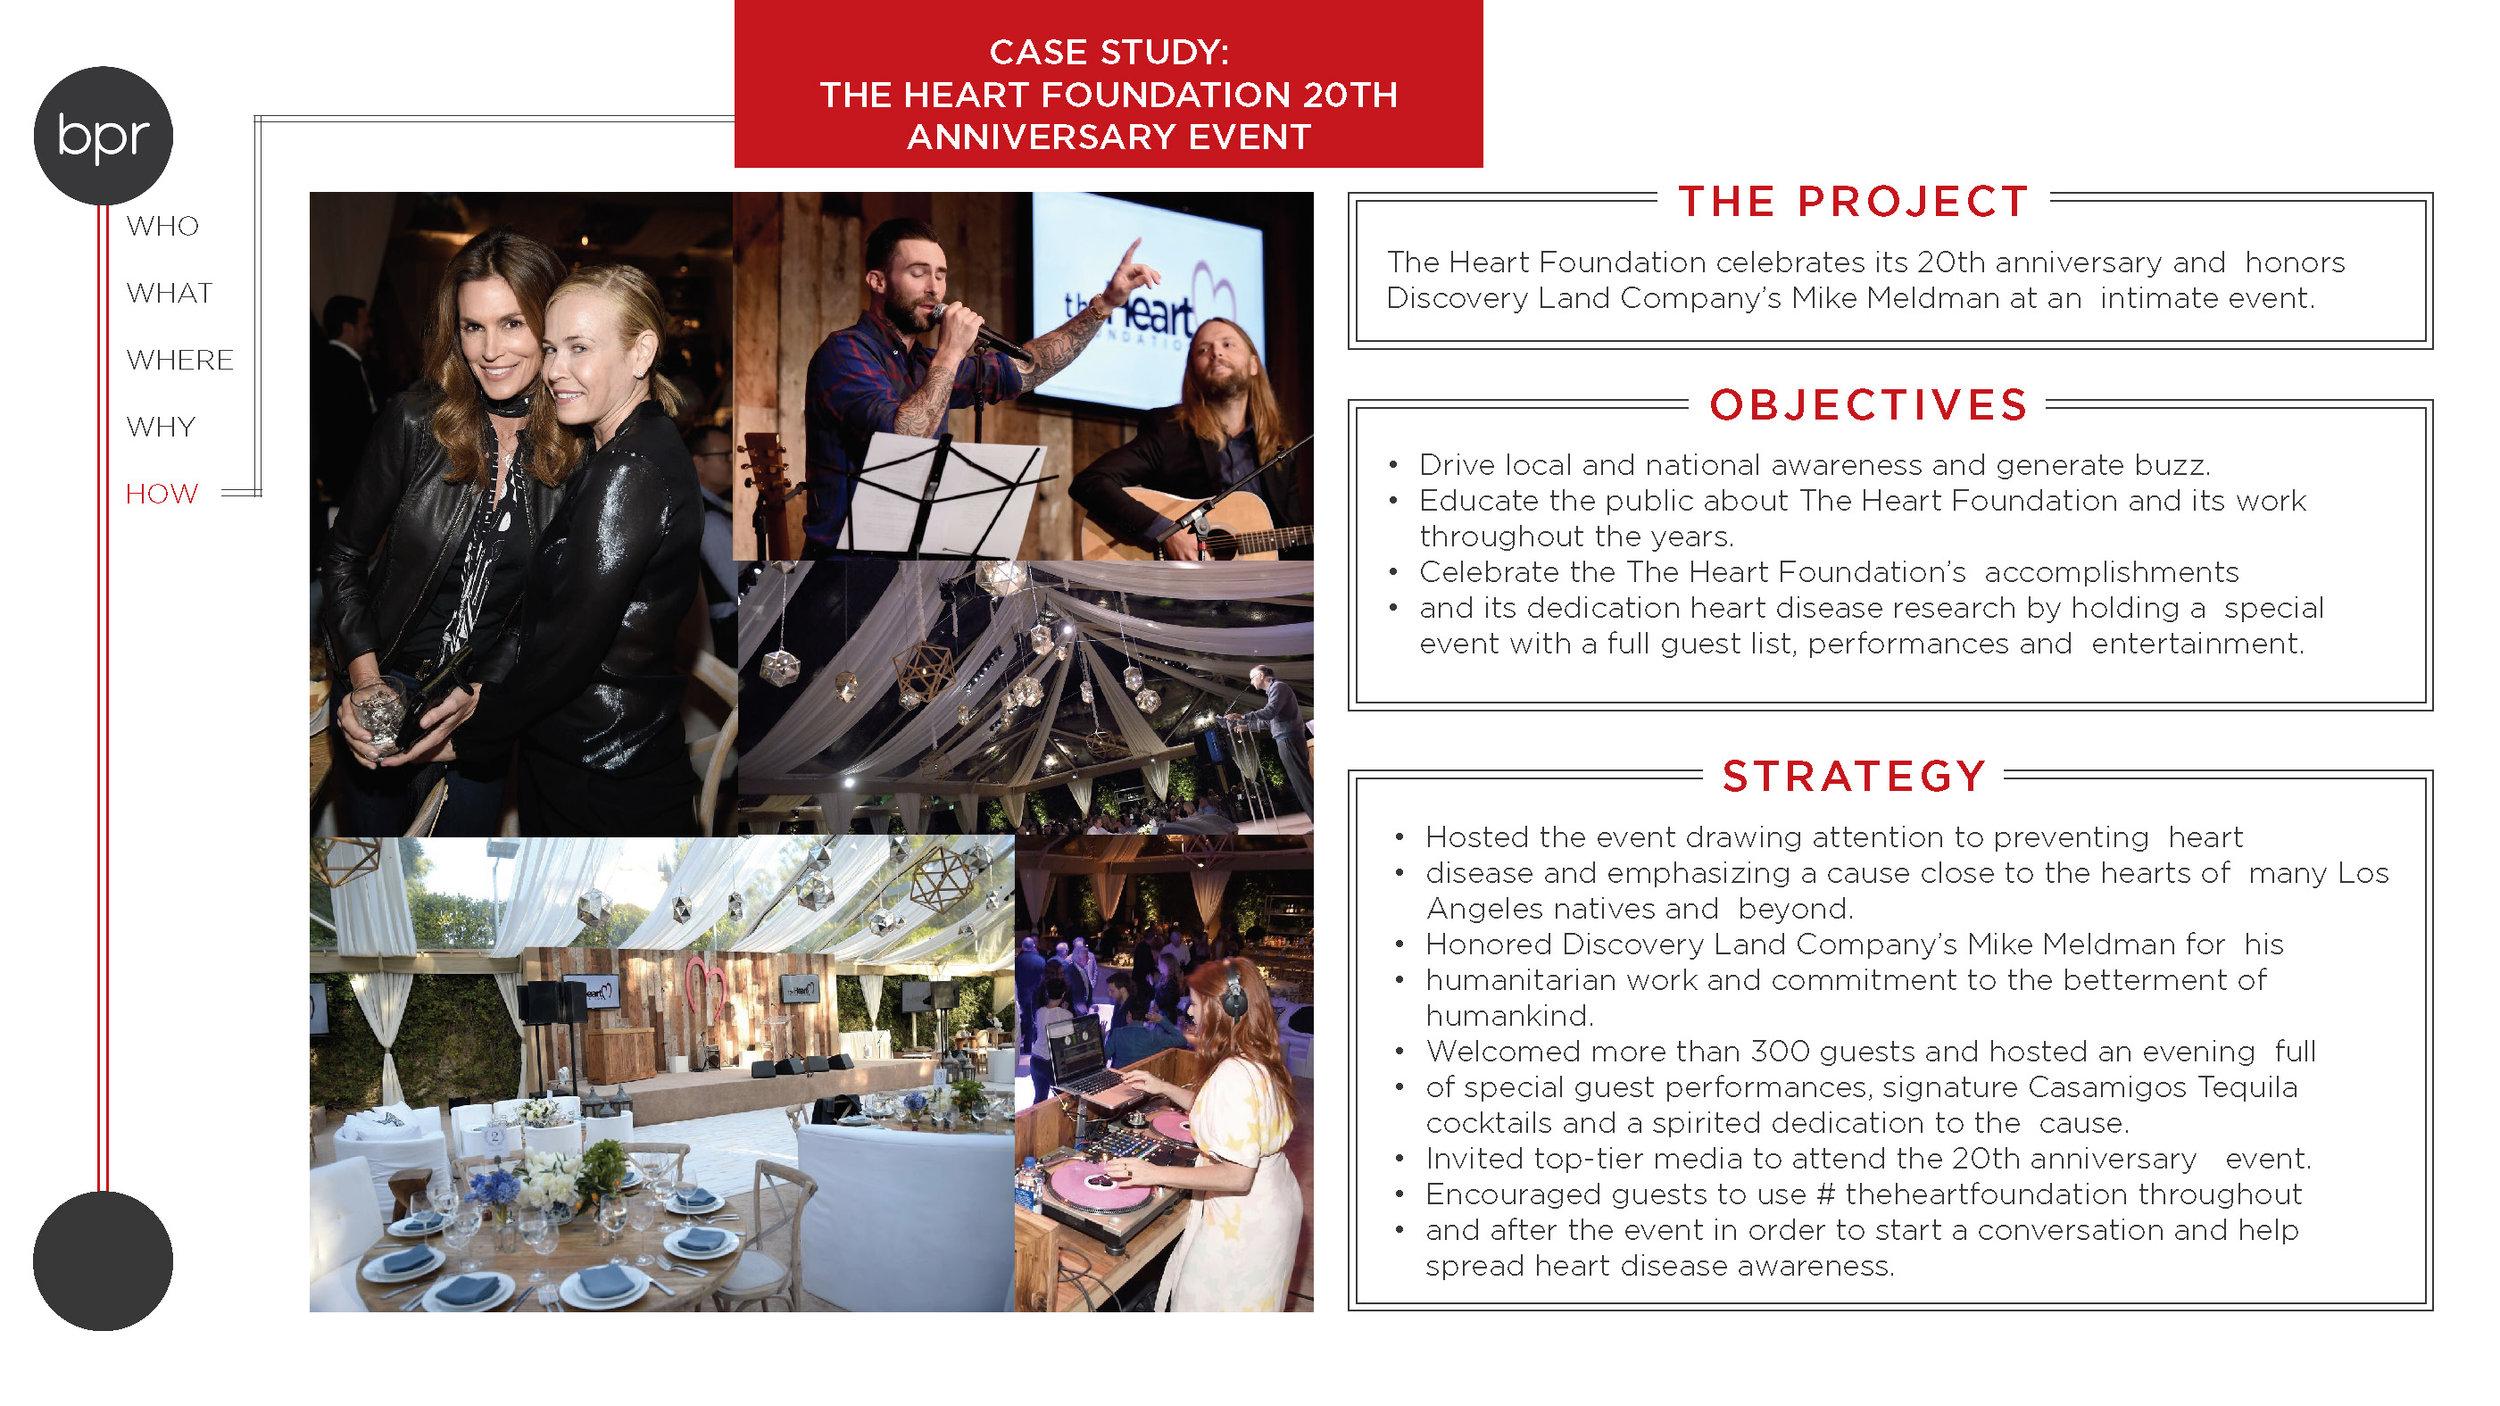 Heart Foundation Case Study_Page_2.jpg